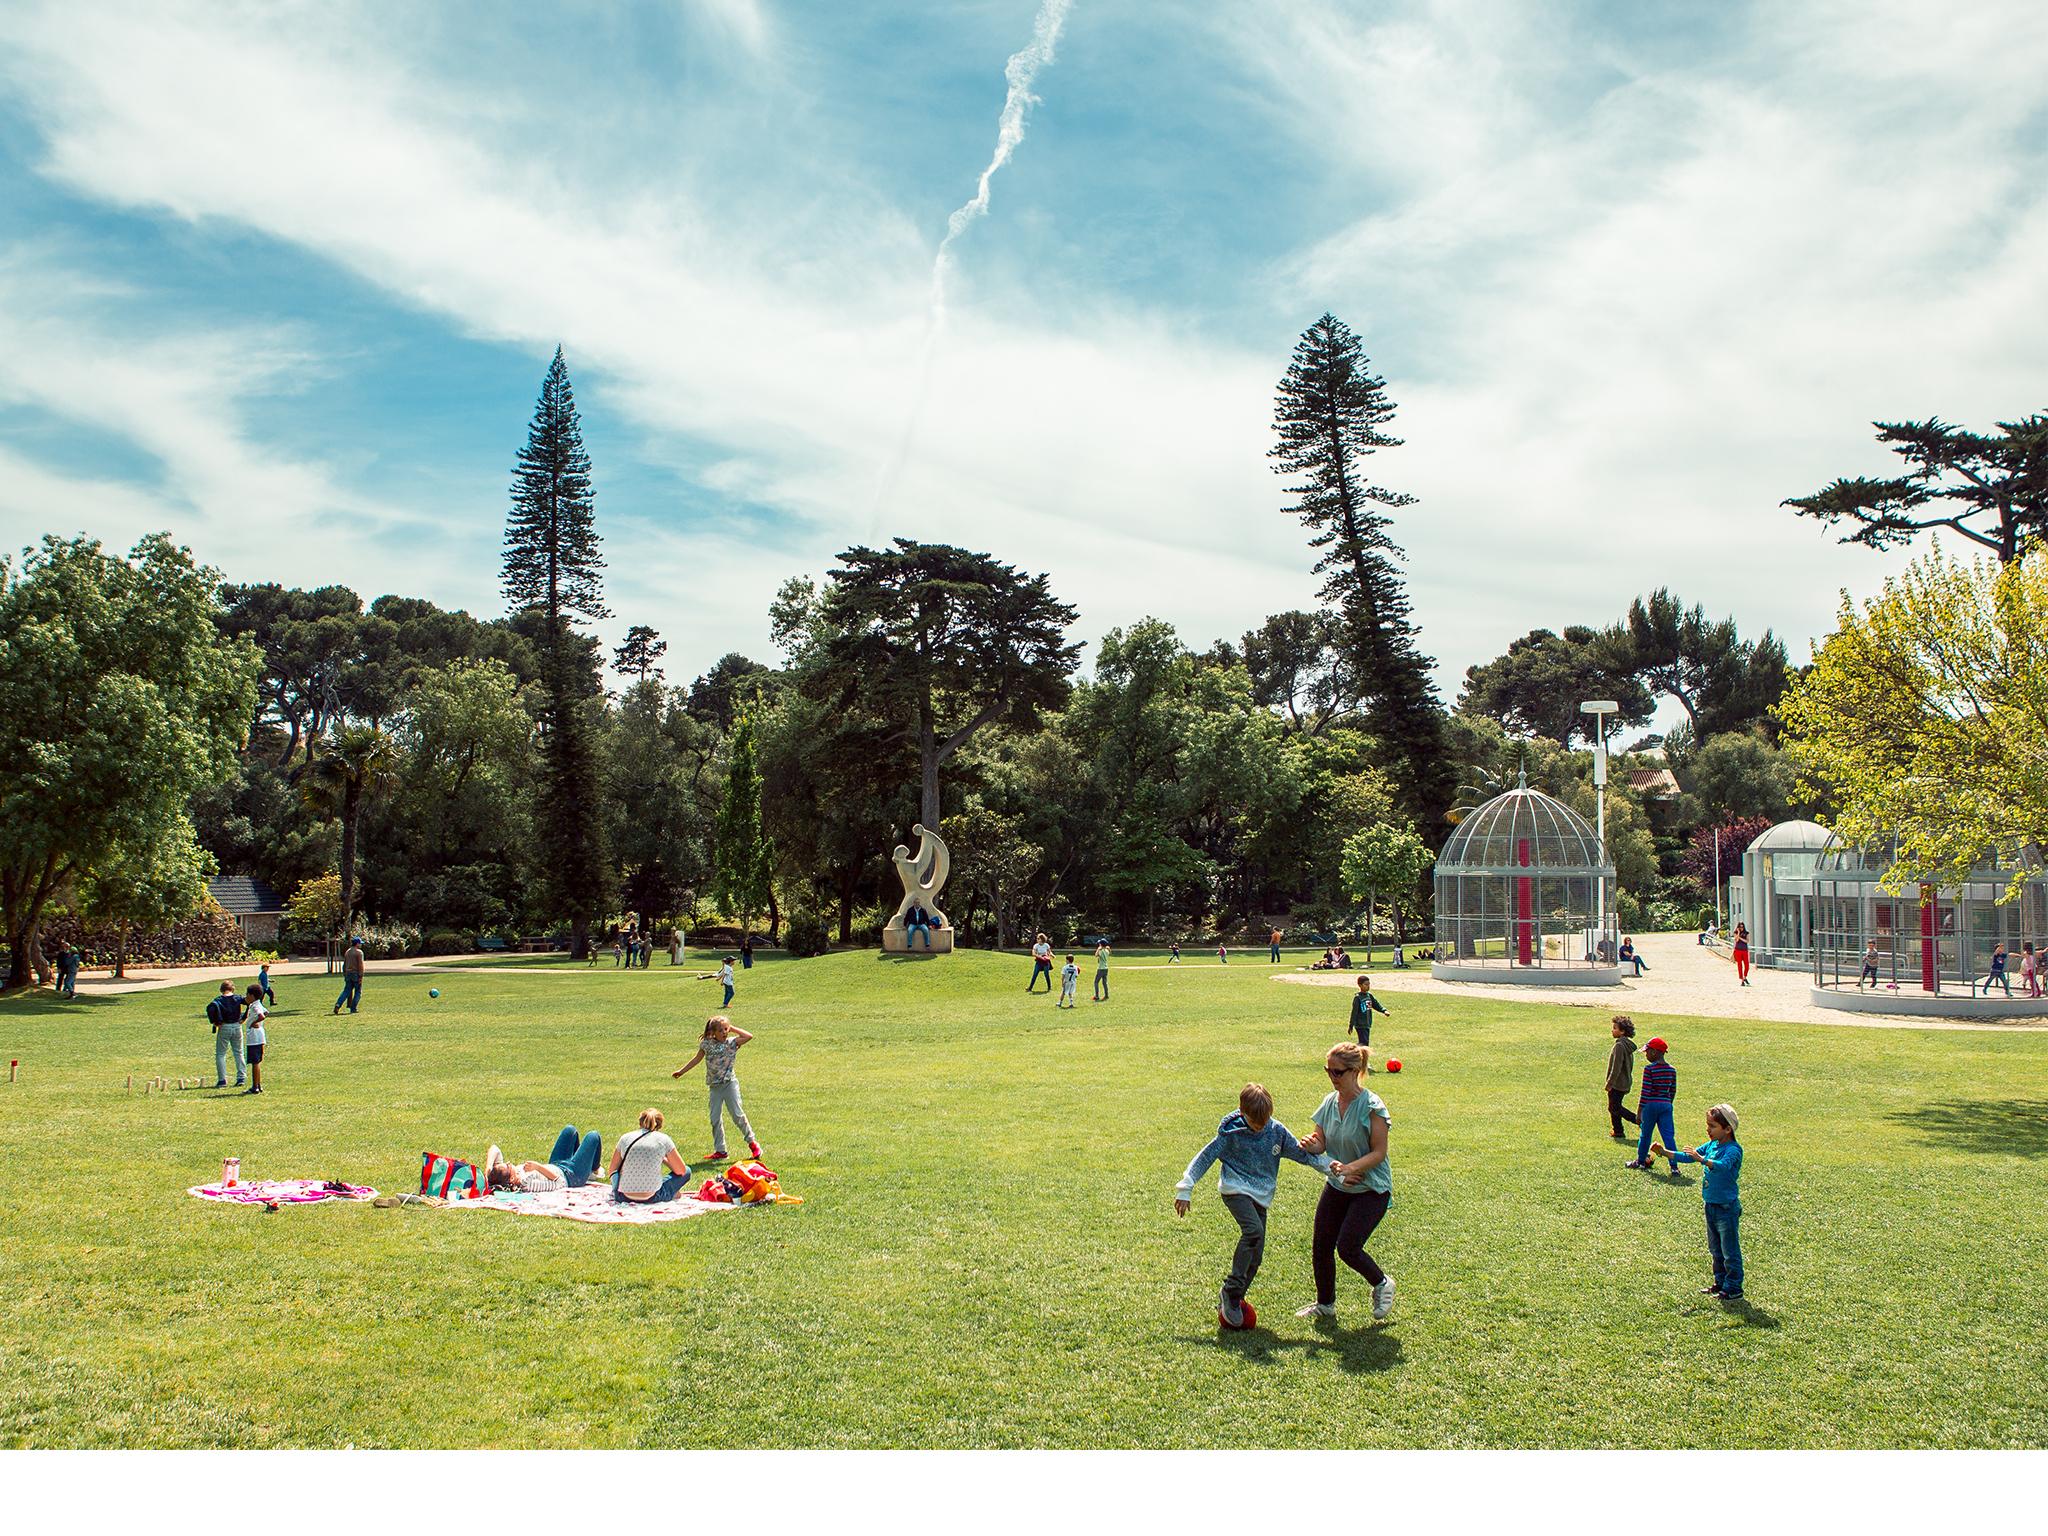 Jardim, Passeios, Actividades, Parque Marechal Carmona, Cascais